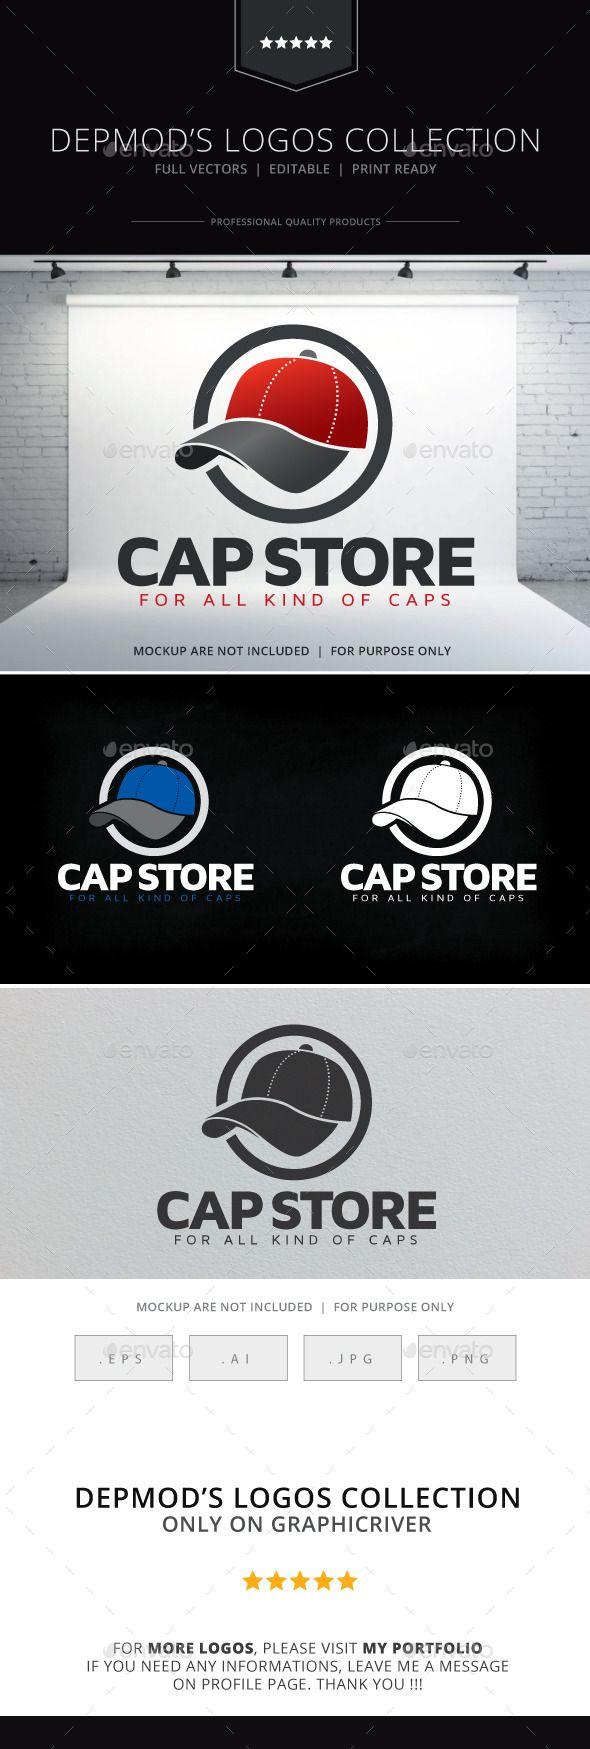 Cap Store Logo — Vector EPS #cap factory #cap • Available here → https://graphicriver.net/item/cap-store-logo/9213626?ref=pxcr